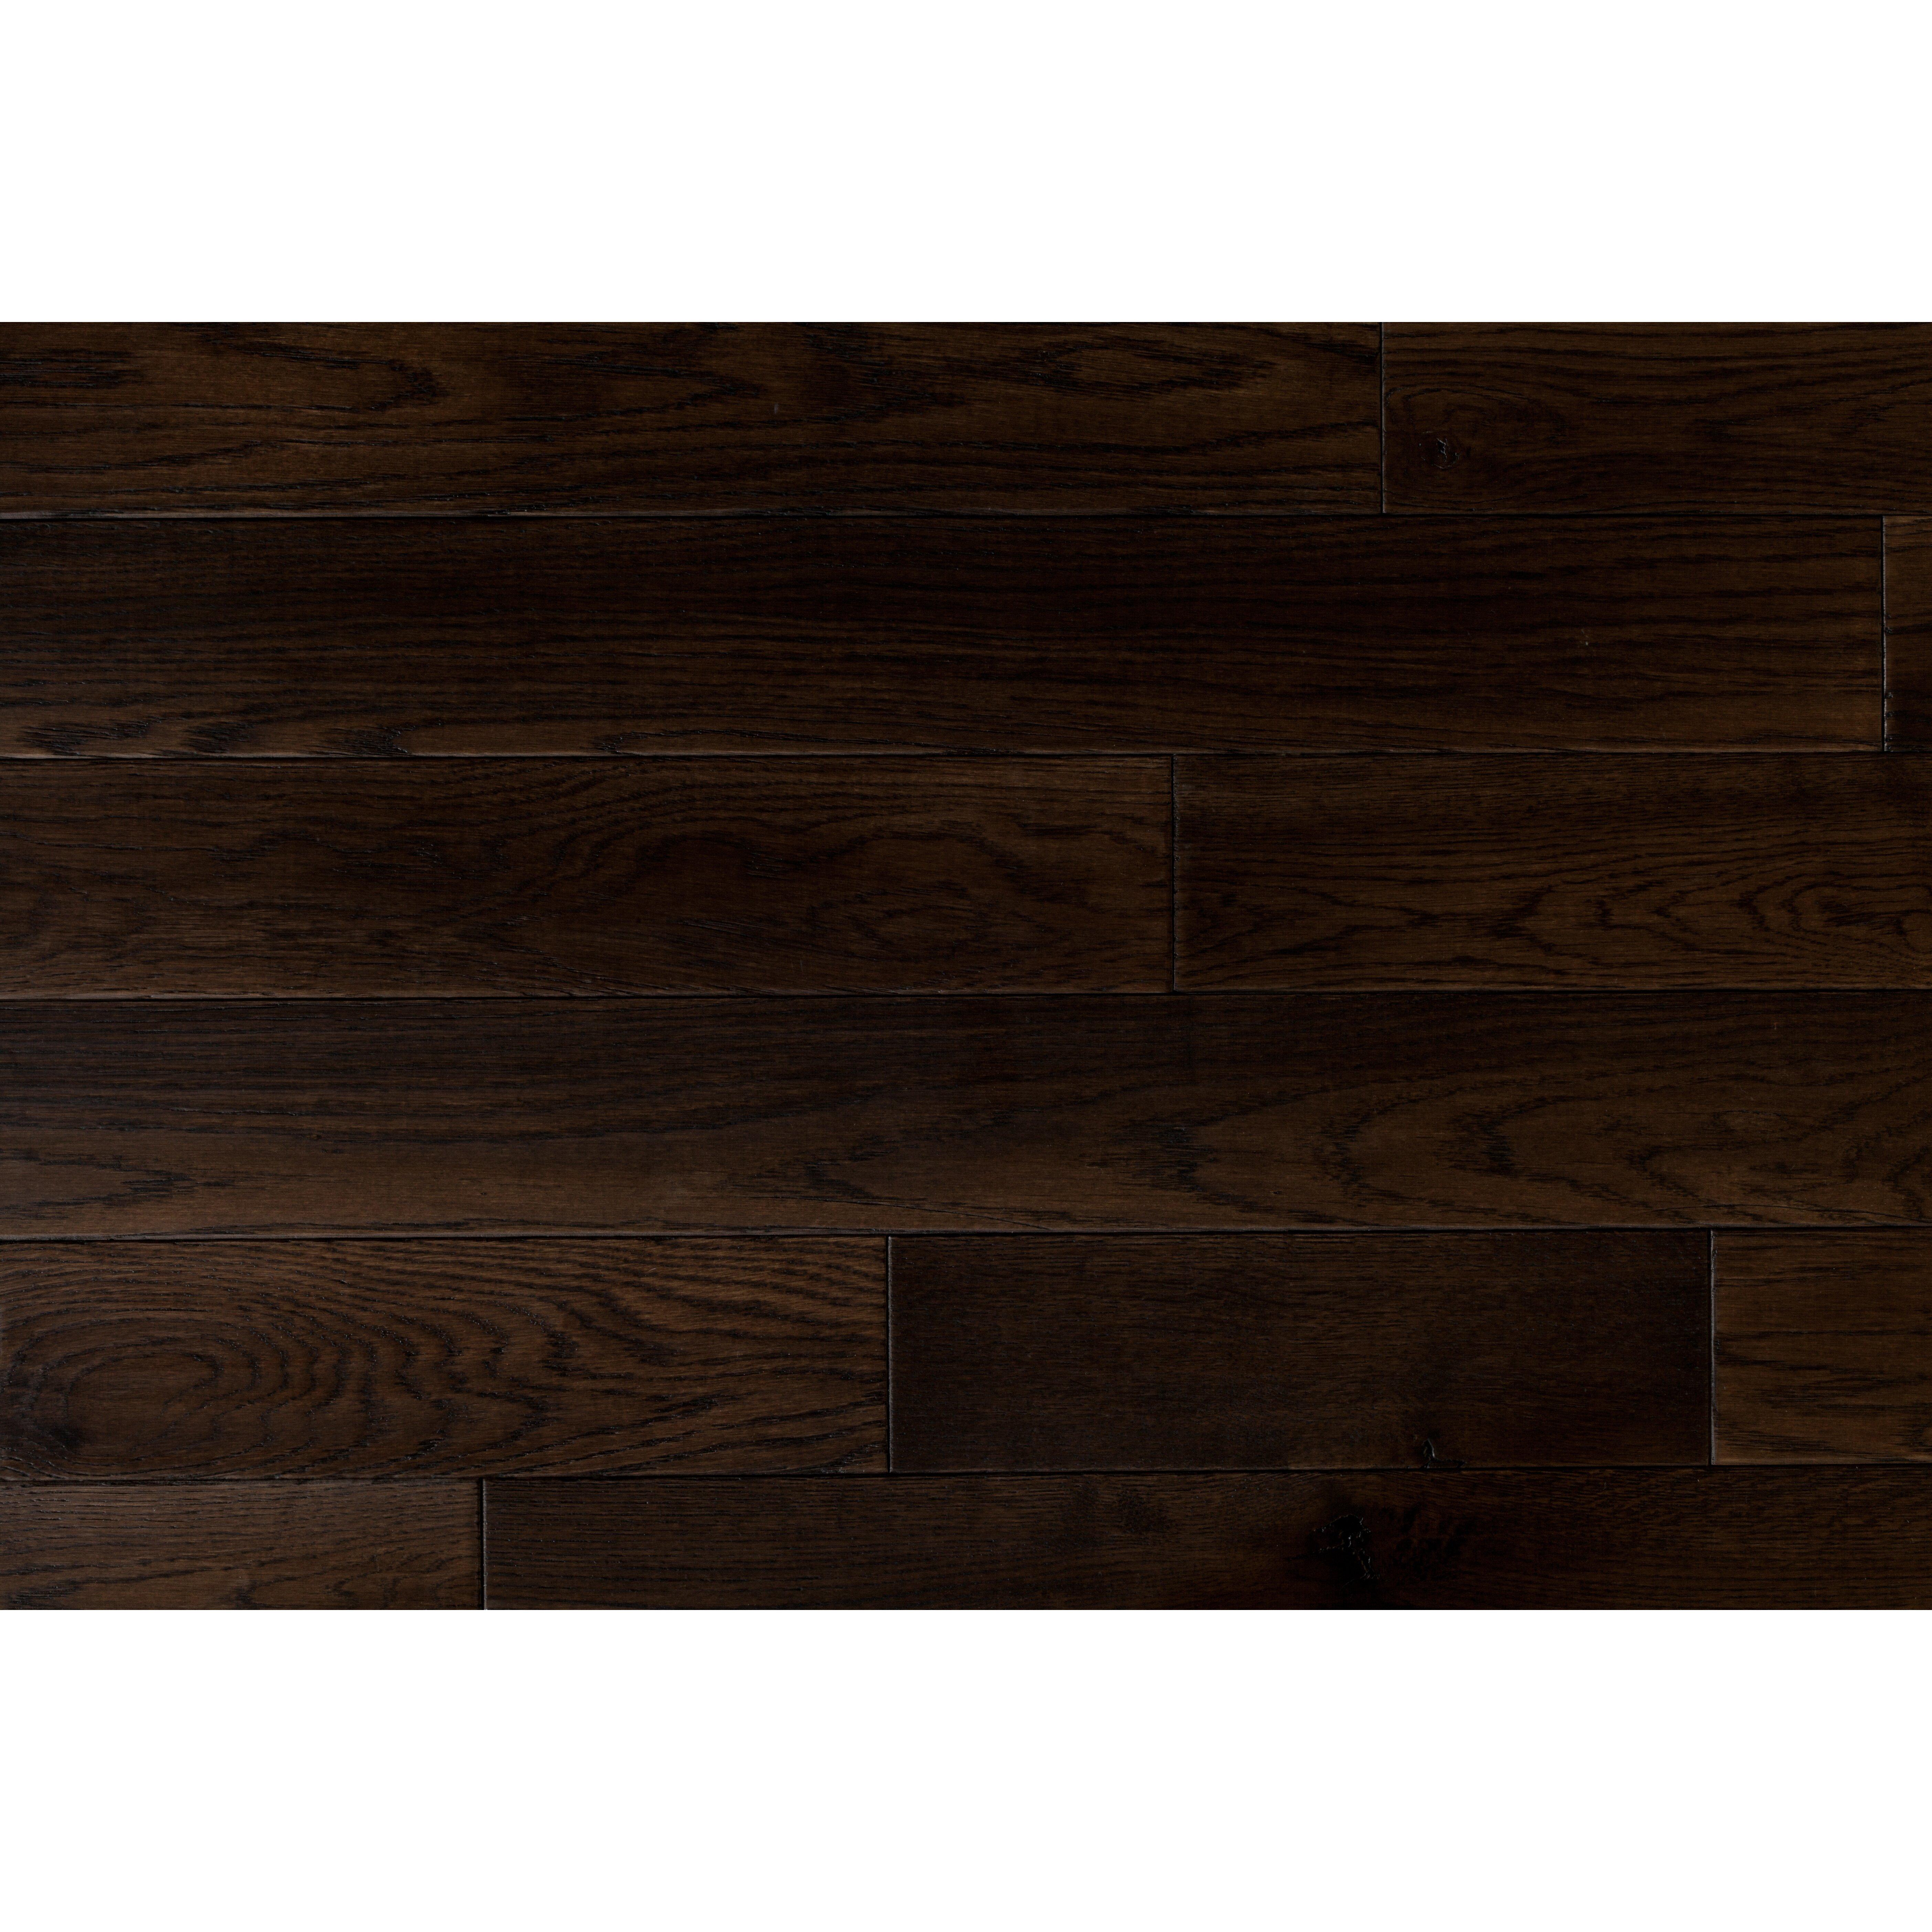 Eddie Bauer Floors River S Edge White Oak 5 Inch Wide